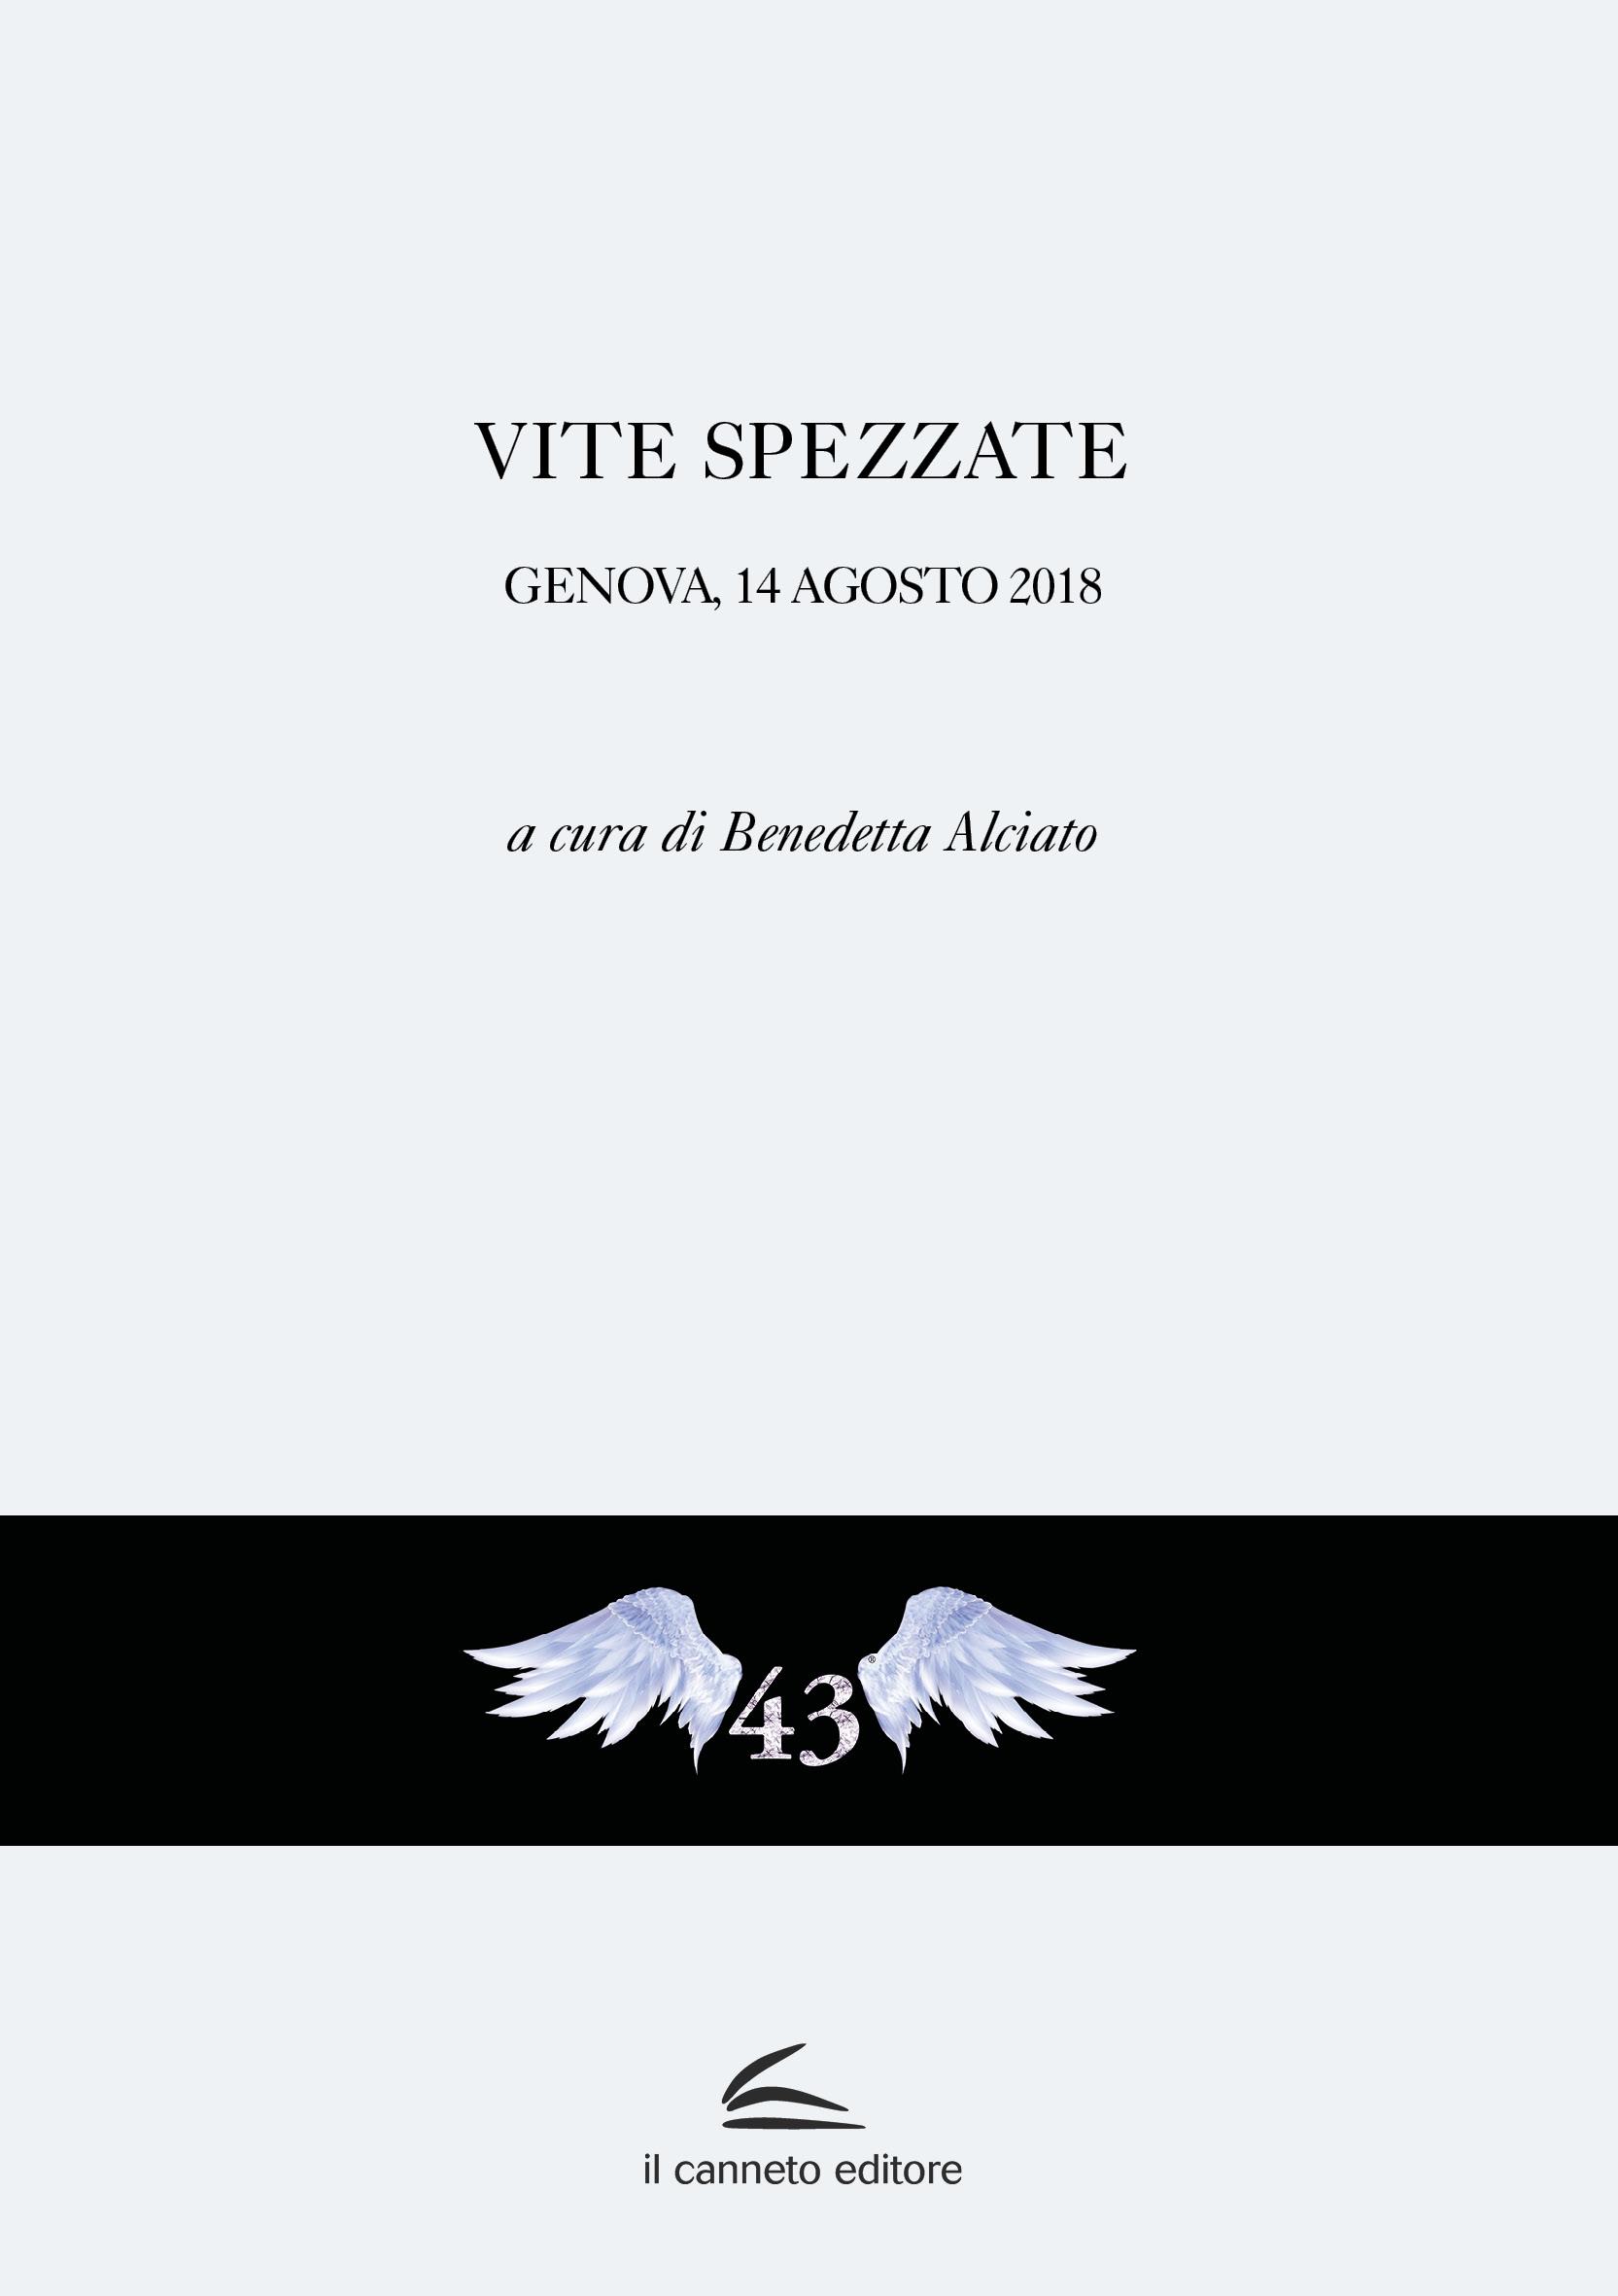 cover_vite spezzate_RGB